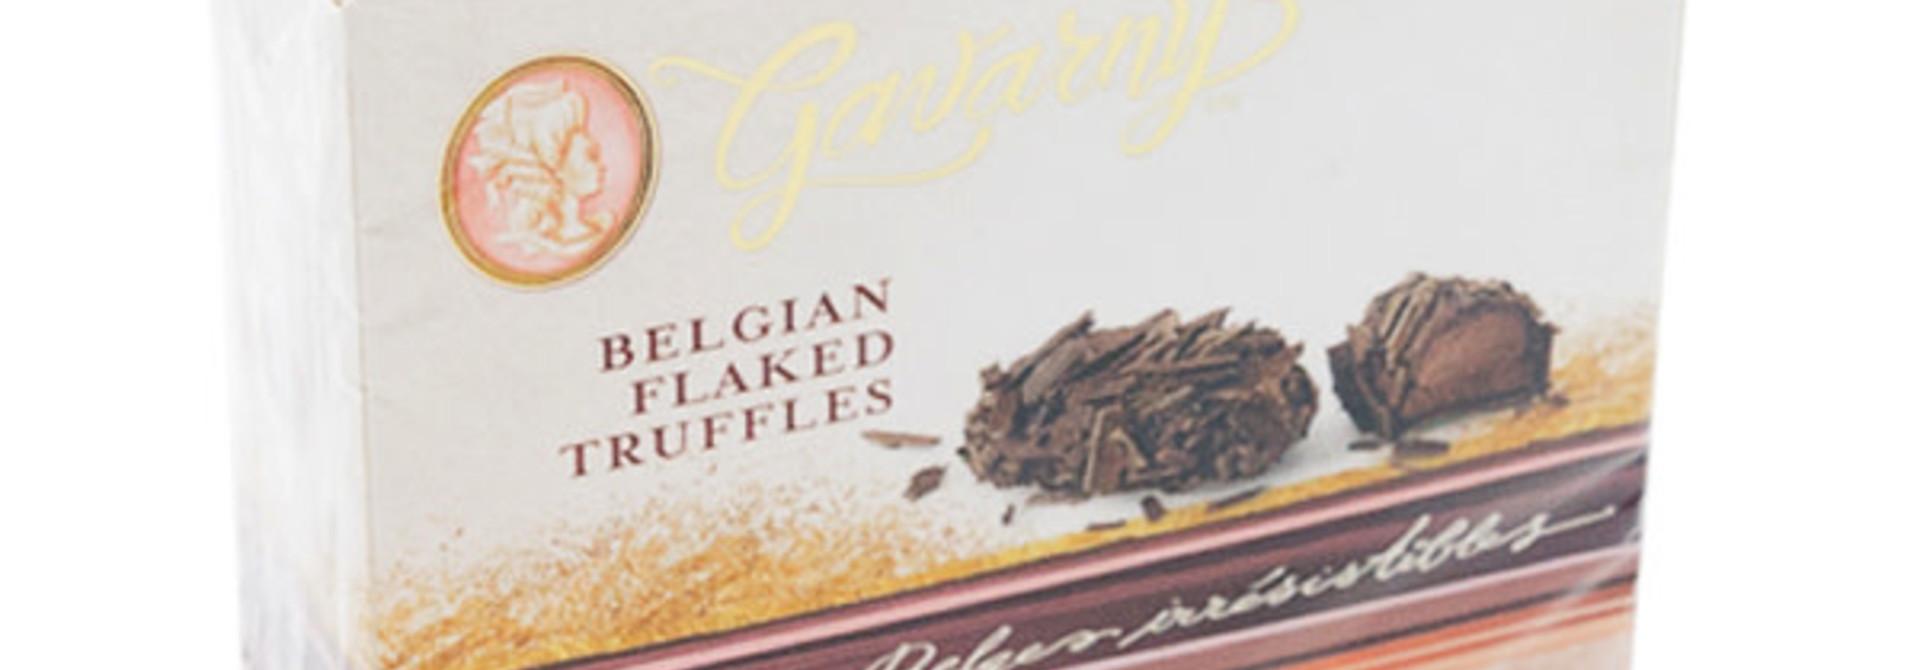 Belgian flaked truffles (dark)